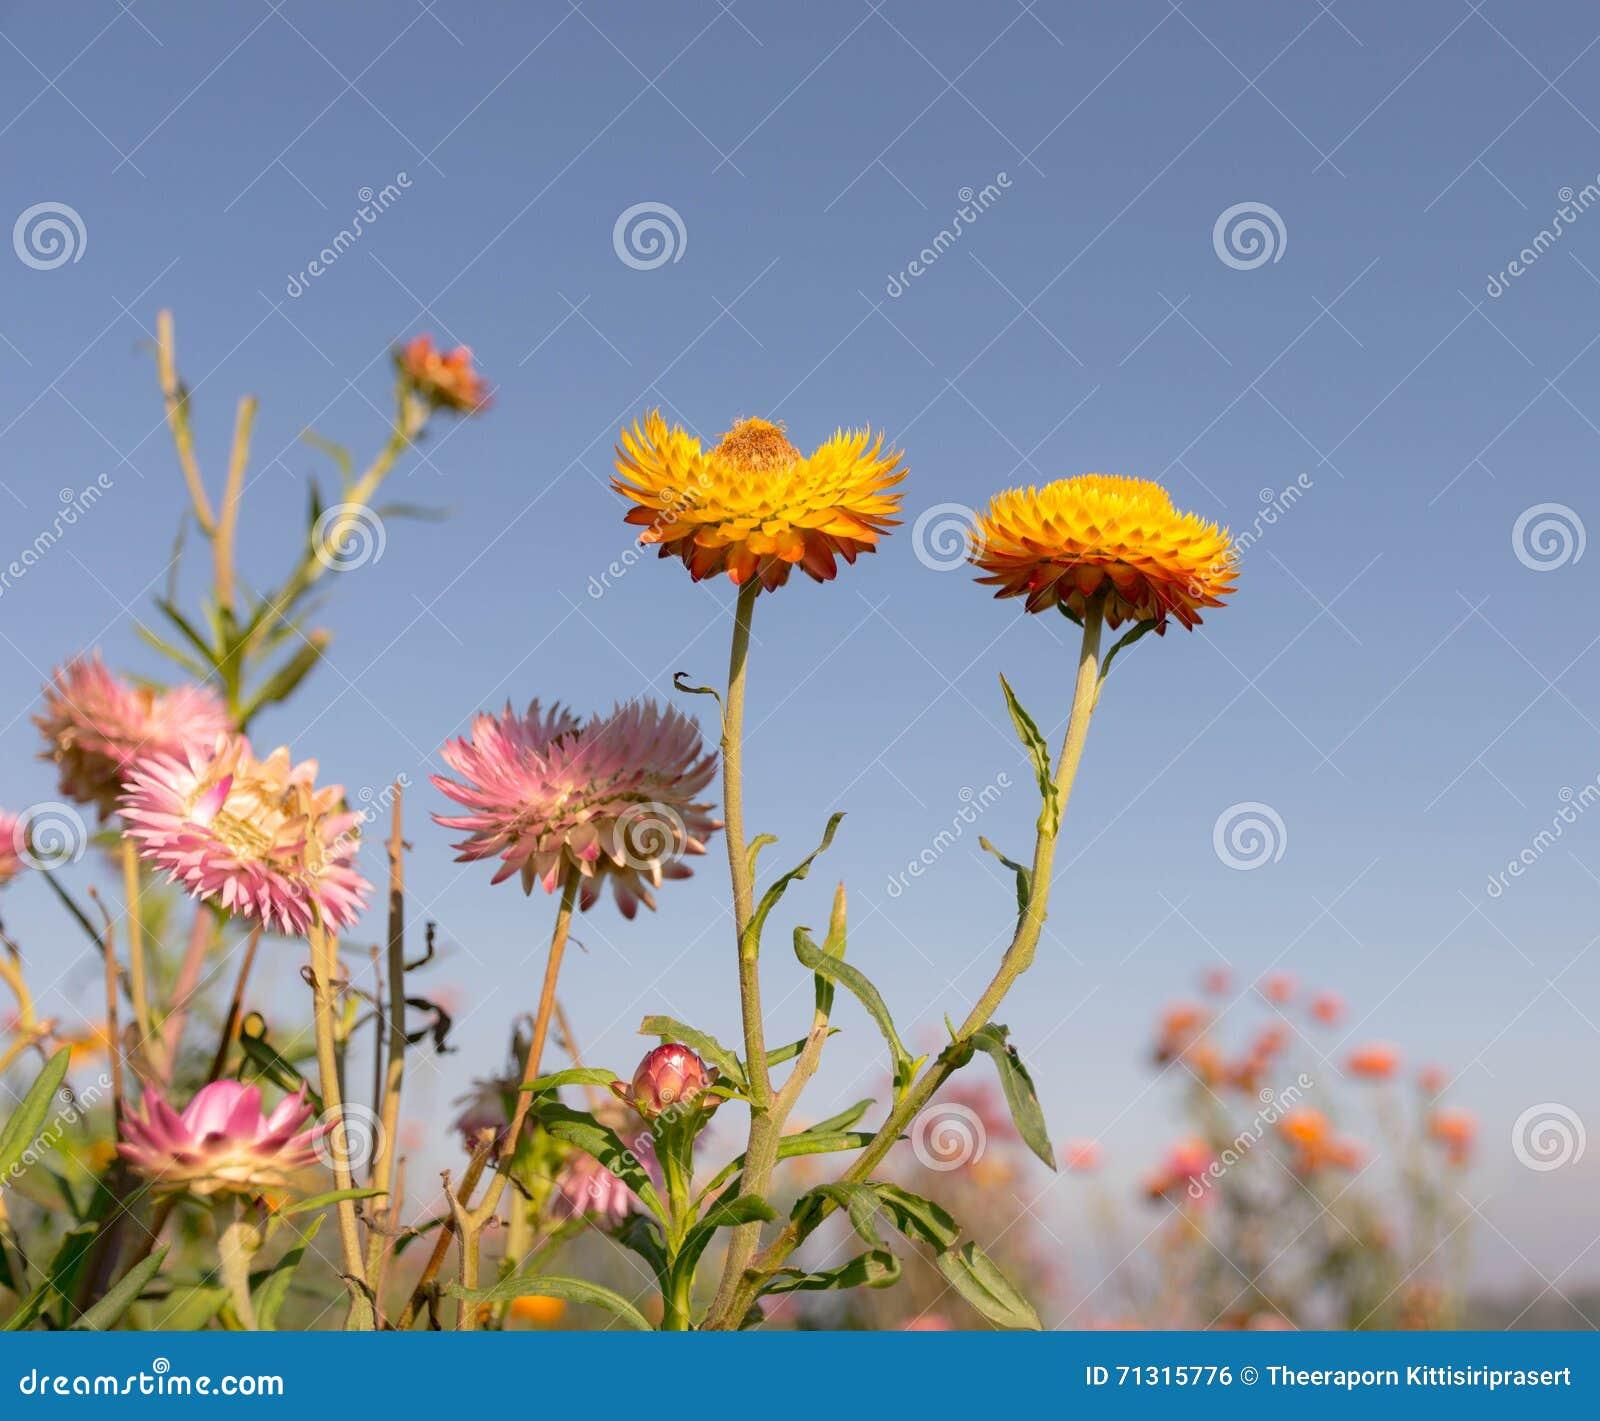 Everlasting flower field stock photo image of blue season 71315776 everlasting flower field izmirmasajfo